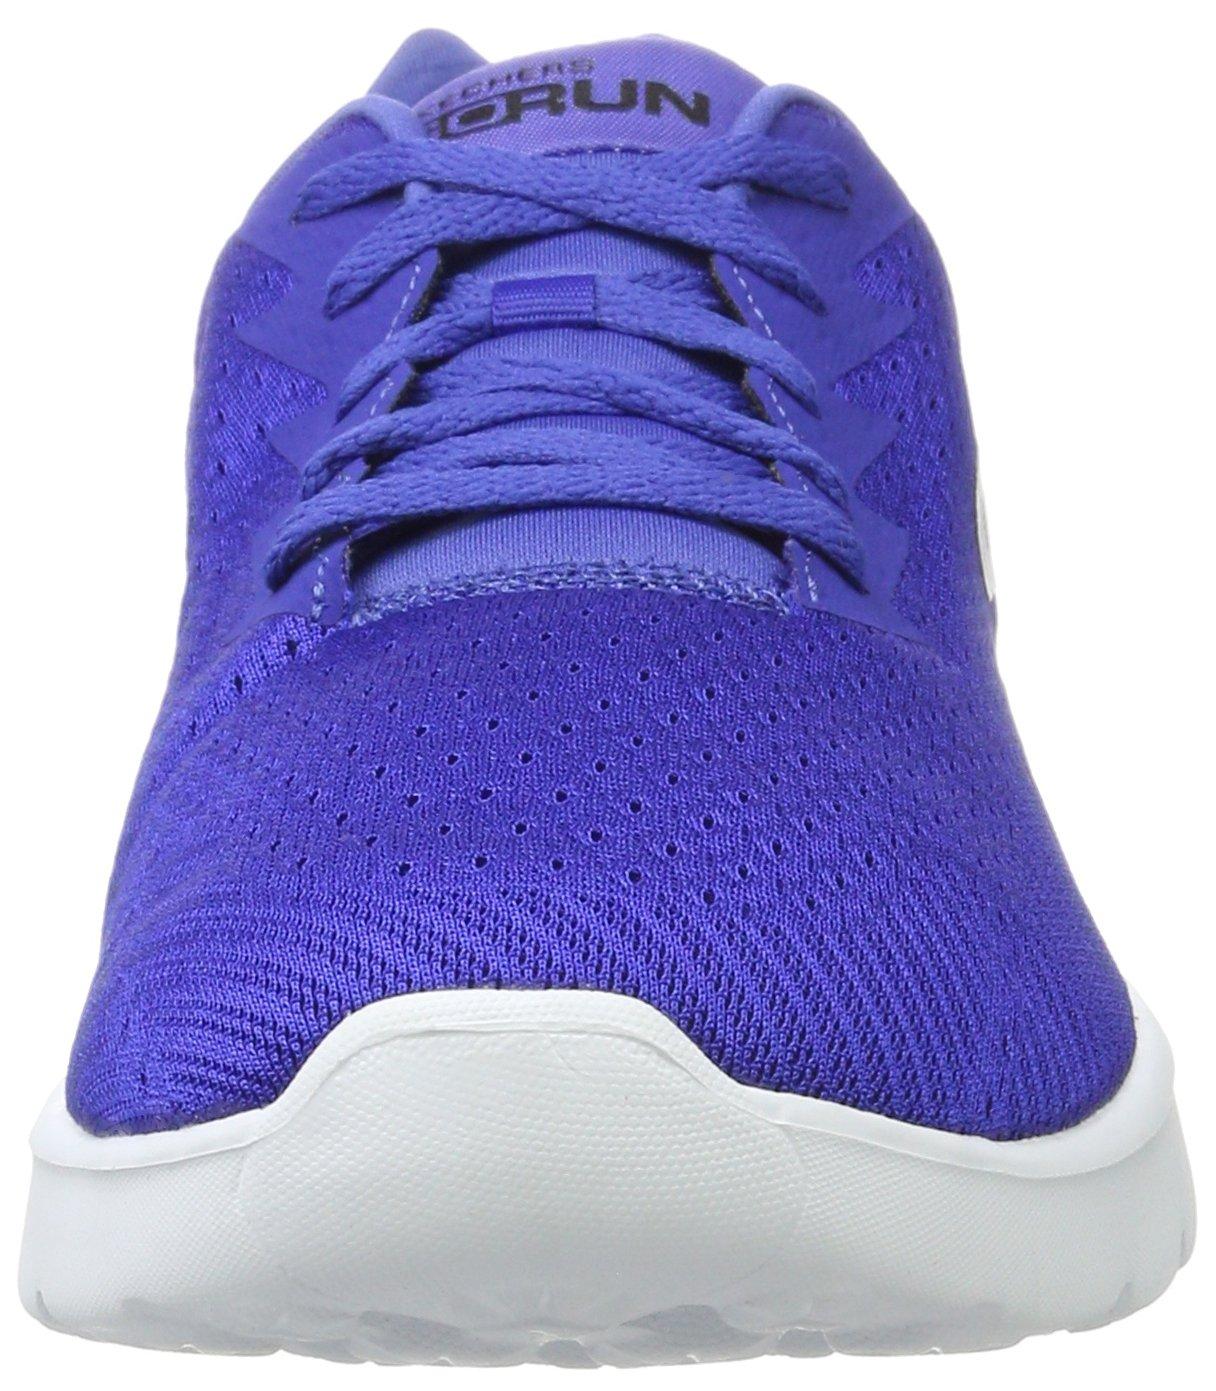 07d132dc7a616 Skechers Performance Men's Go Run 400 Disperse Running Shoe - SGR4G7271804  < Road Running < Clothing, Shoes & Jewelry - tibs